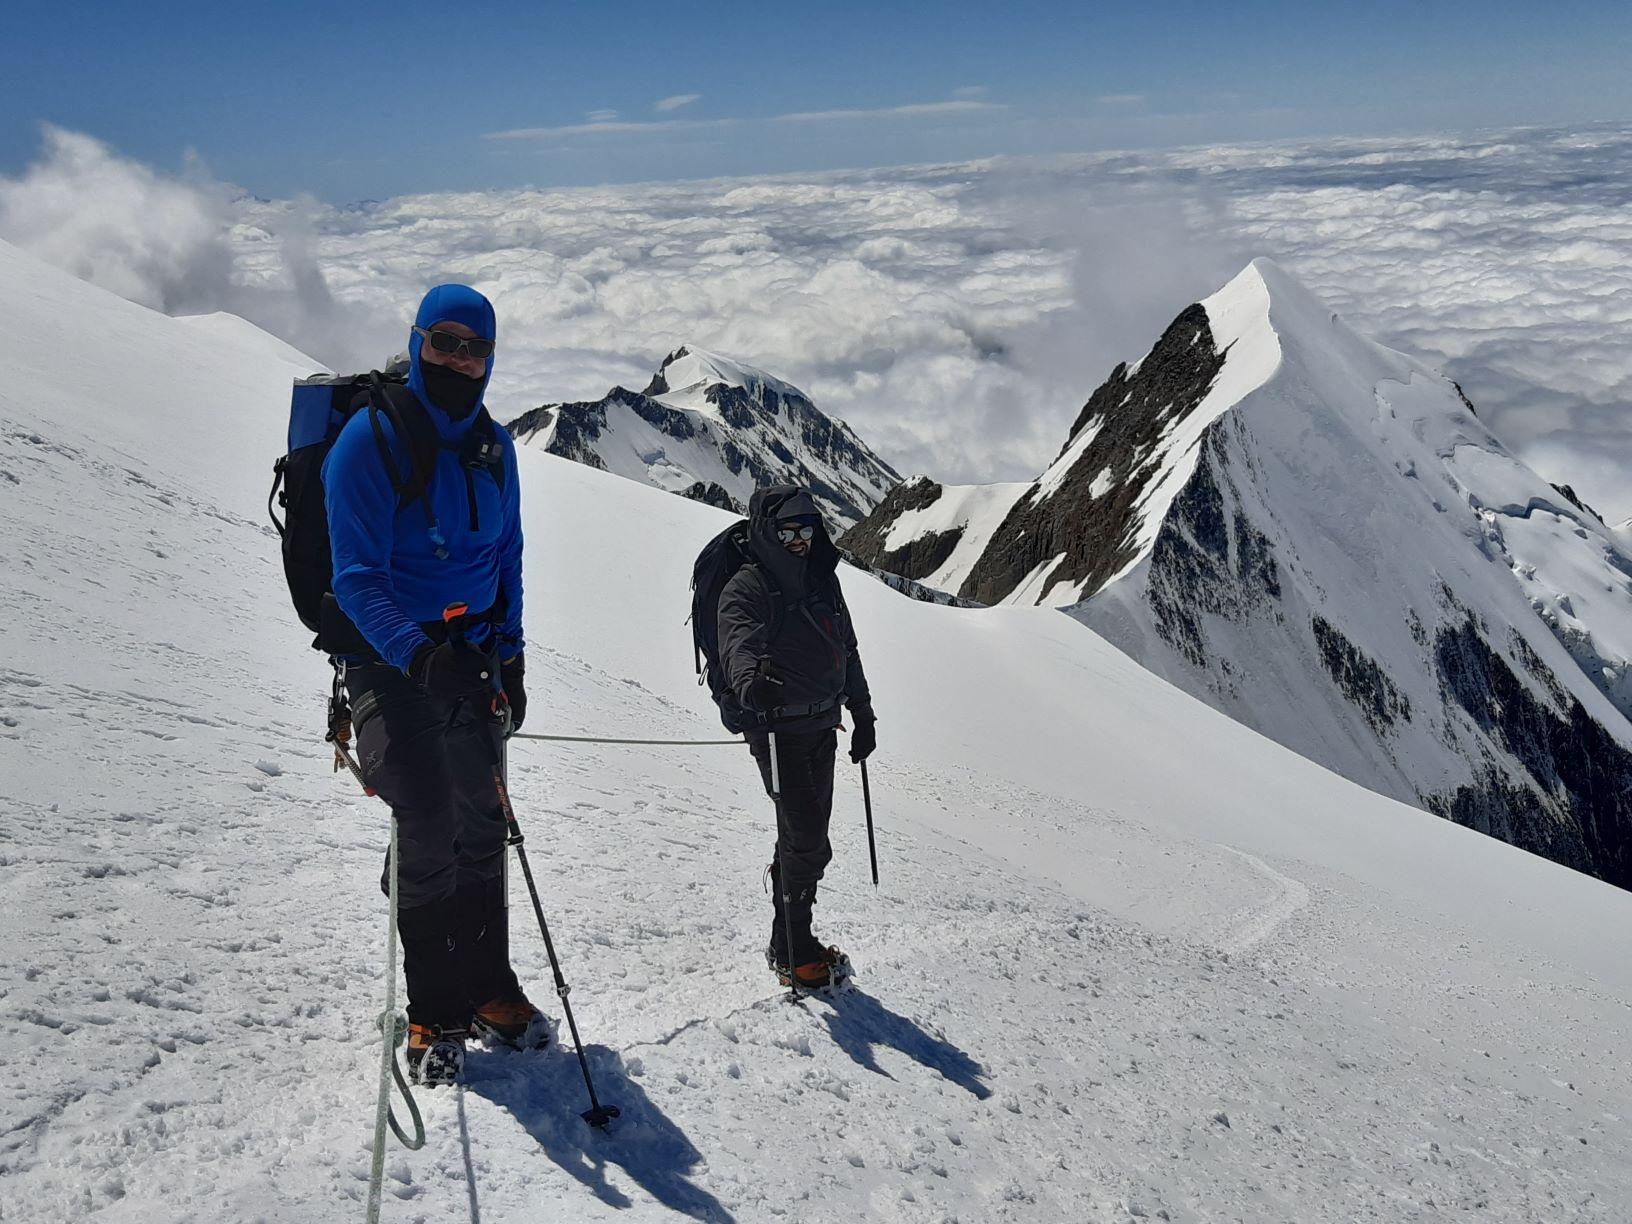 Weismiess-Allalinhorn-Rifugio guide del Cervino-Mont Blanc (4810 m)